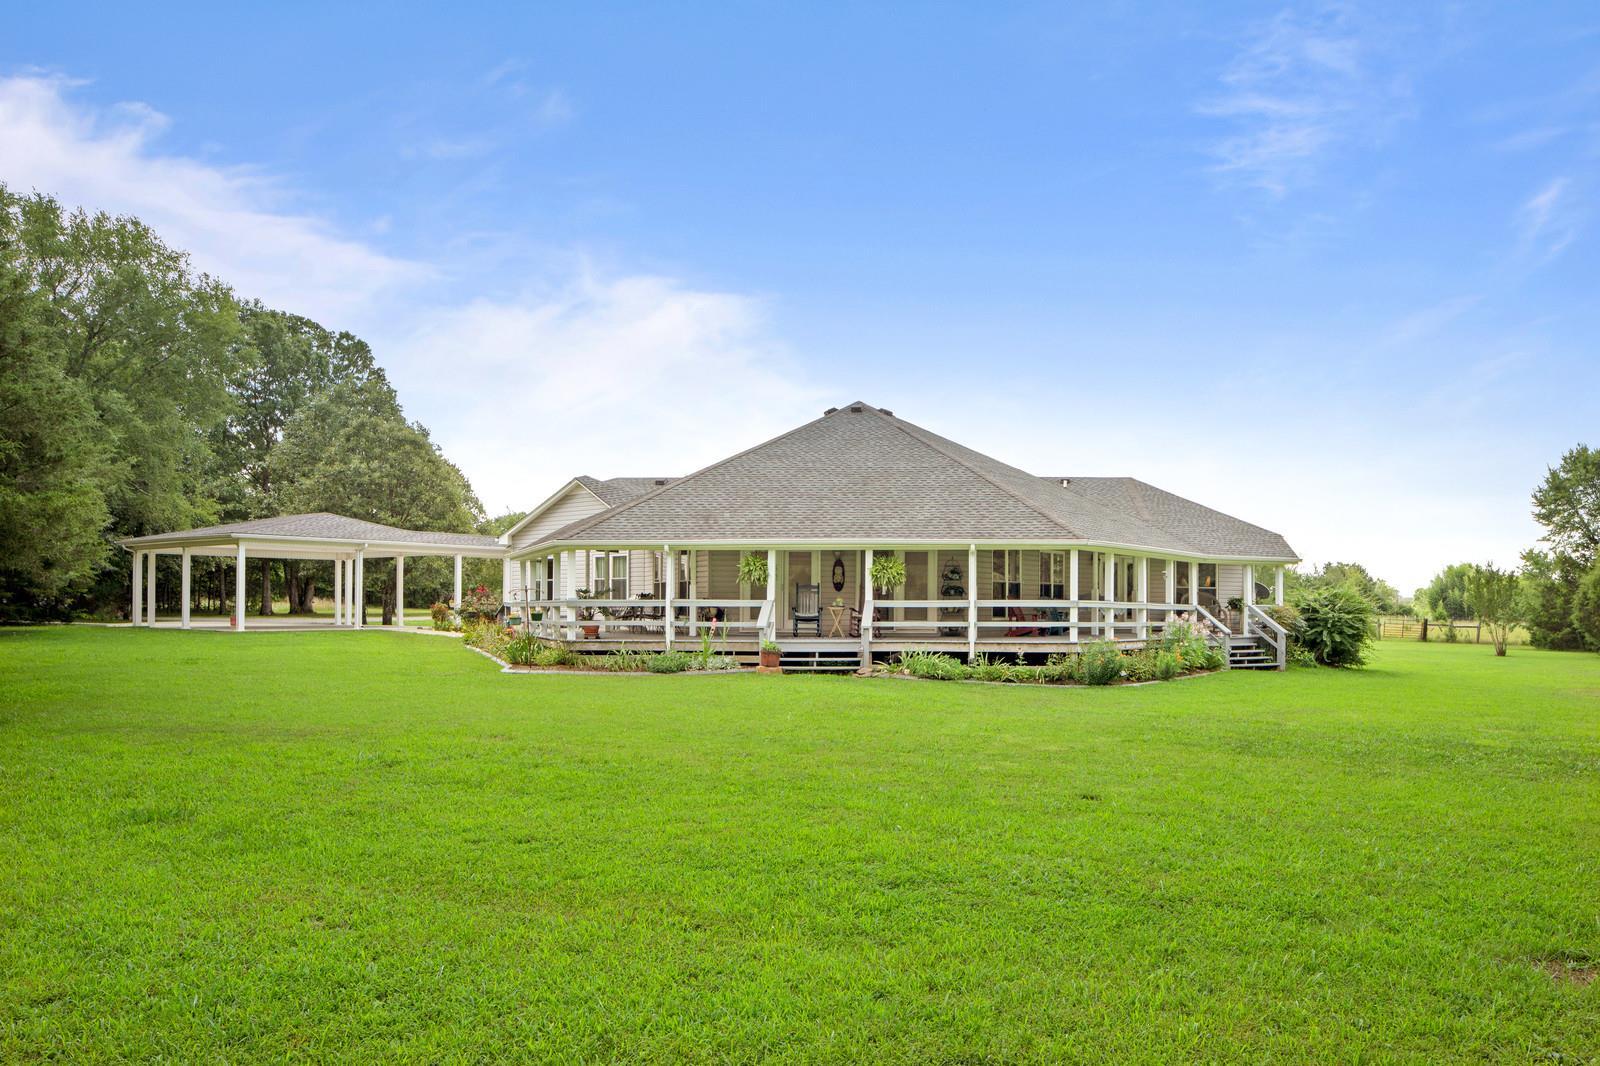 5620 Morgan Rd, Rockvale, TN 37153 - Rockvale, TN real estate listing